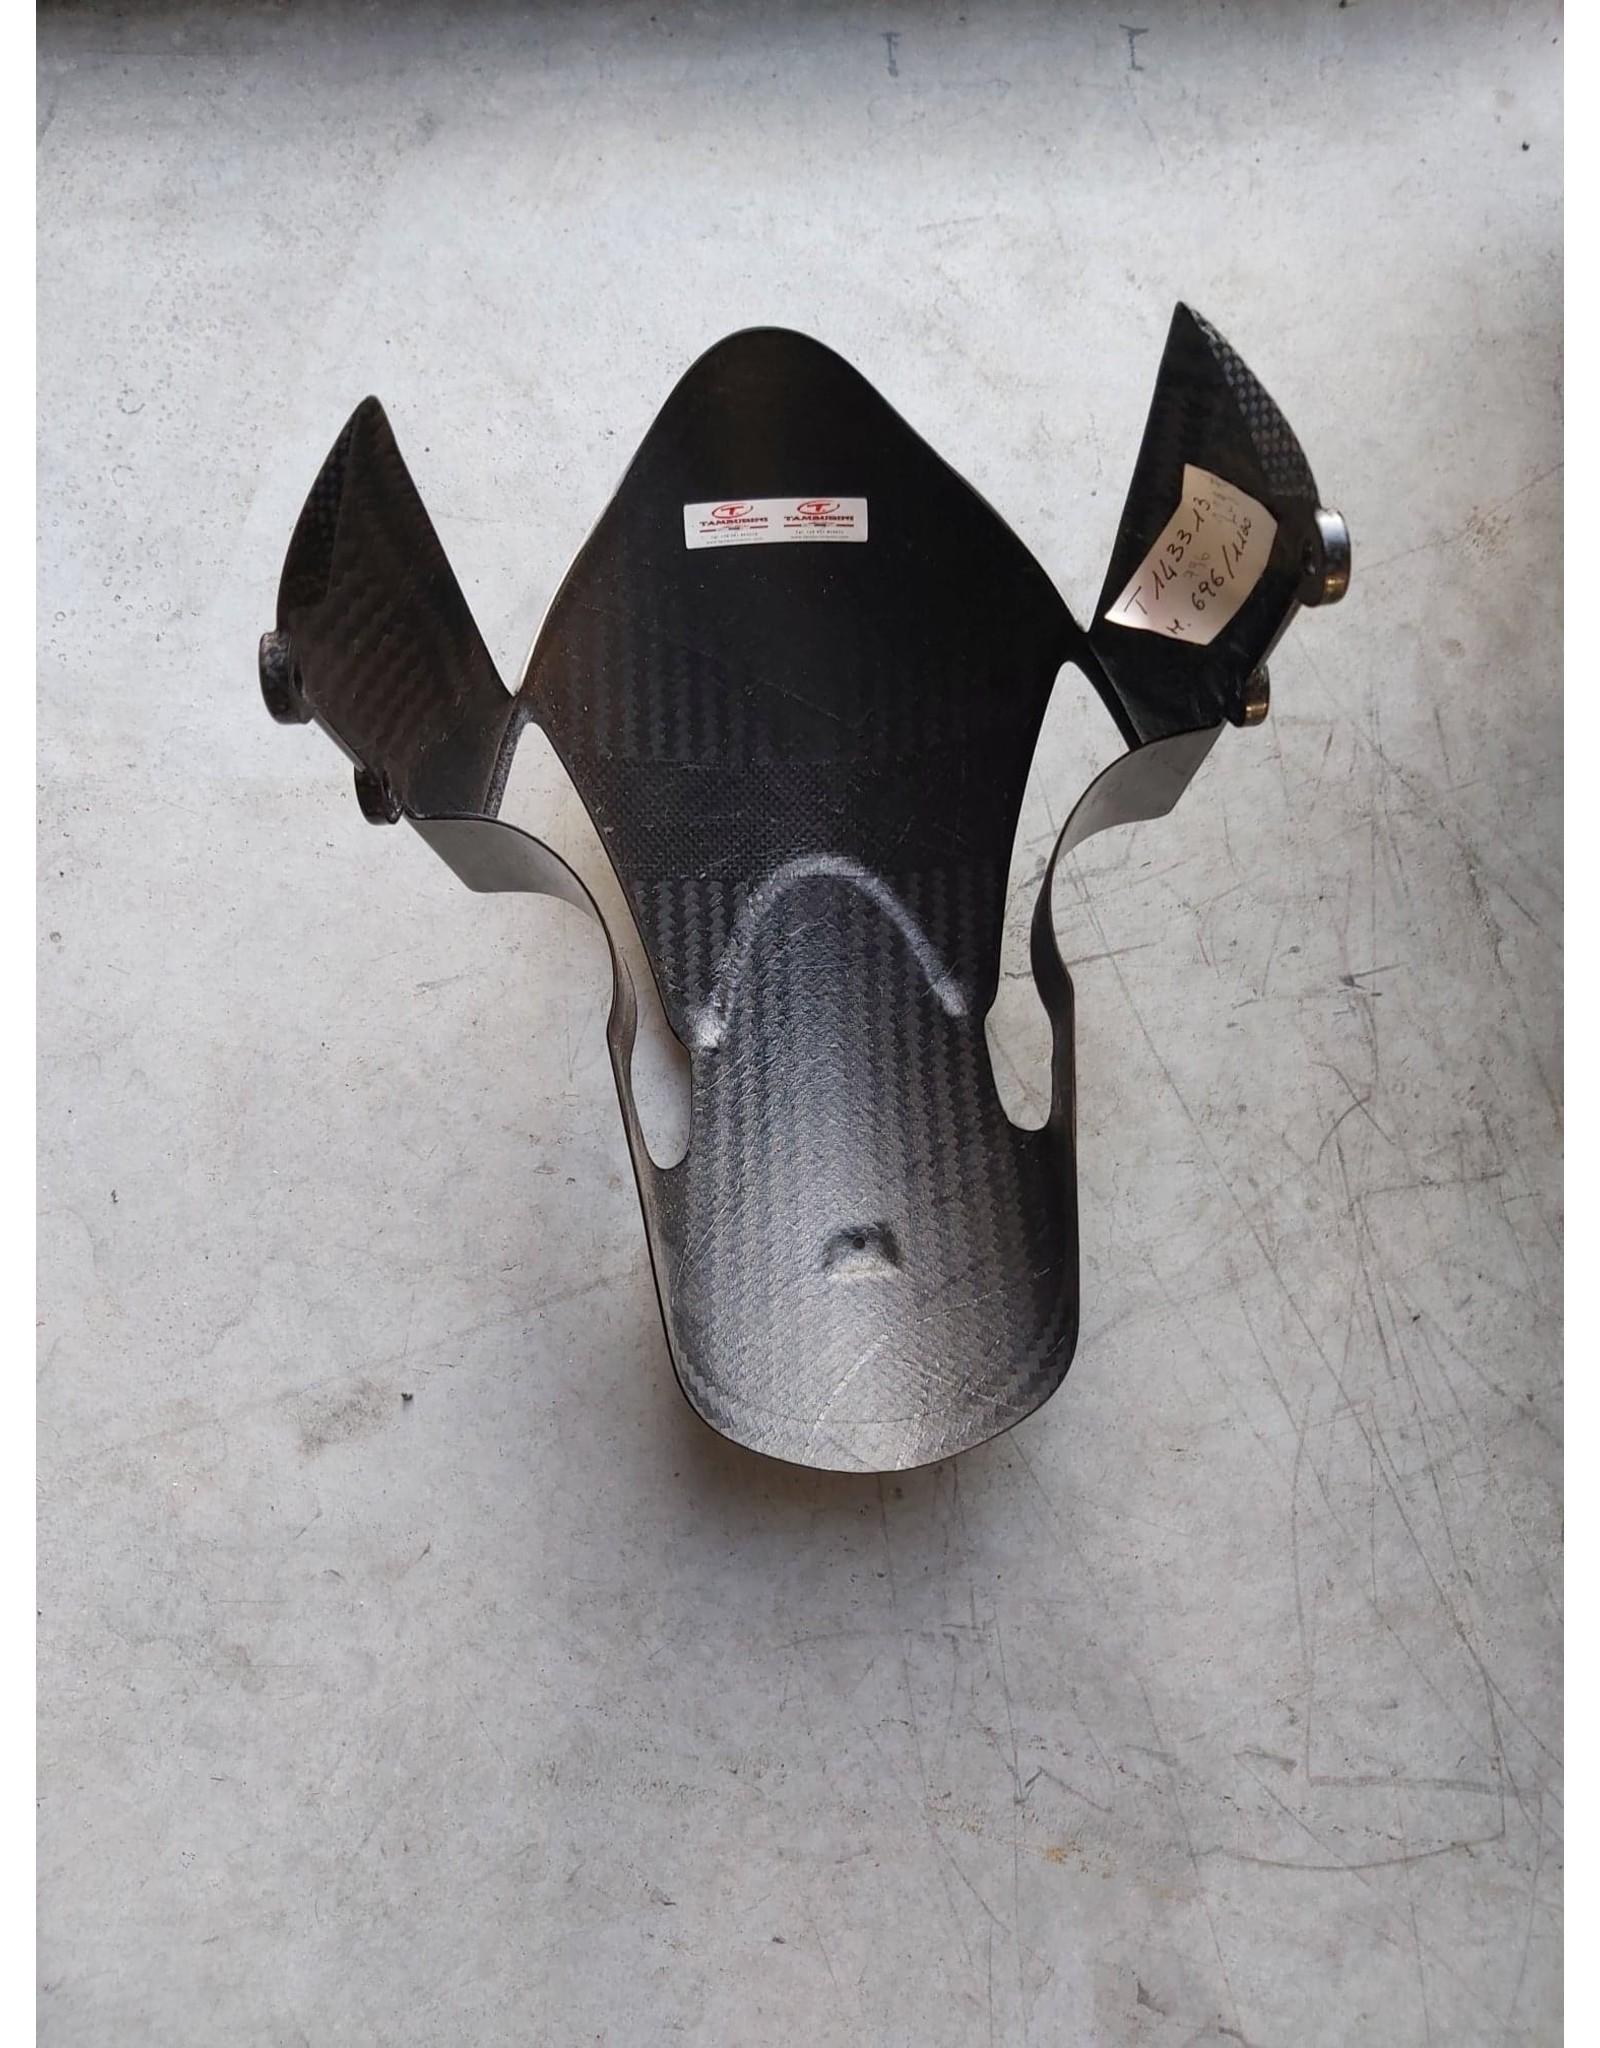 Ducati Ducati Monster 696 796 1100 carbon voorspatbord